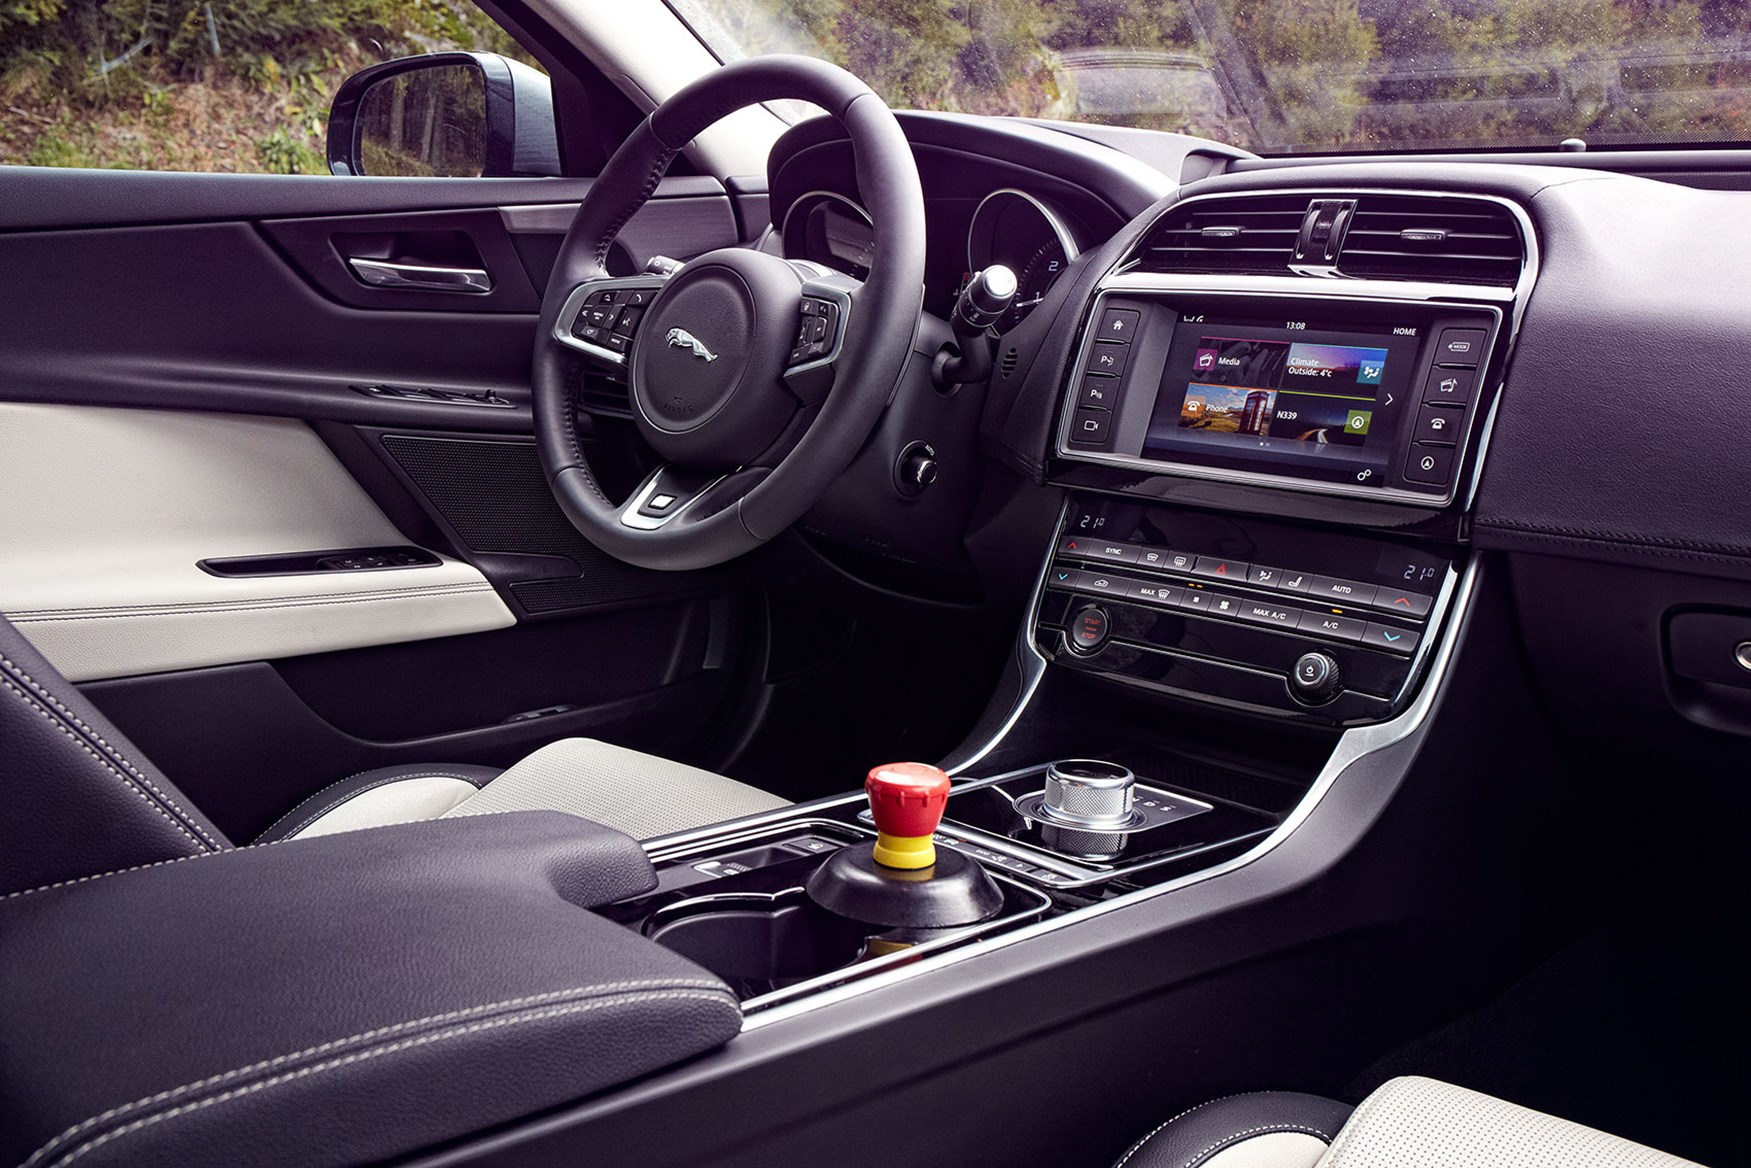 Rangee 2013 the hybrid electric Range Rover Sport